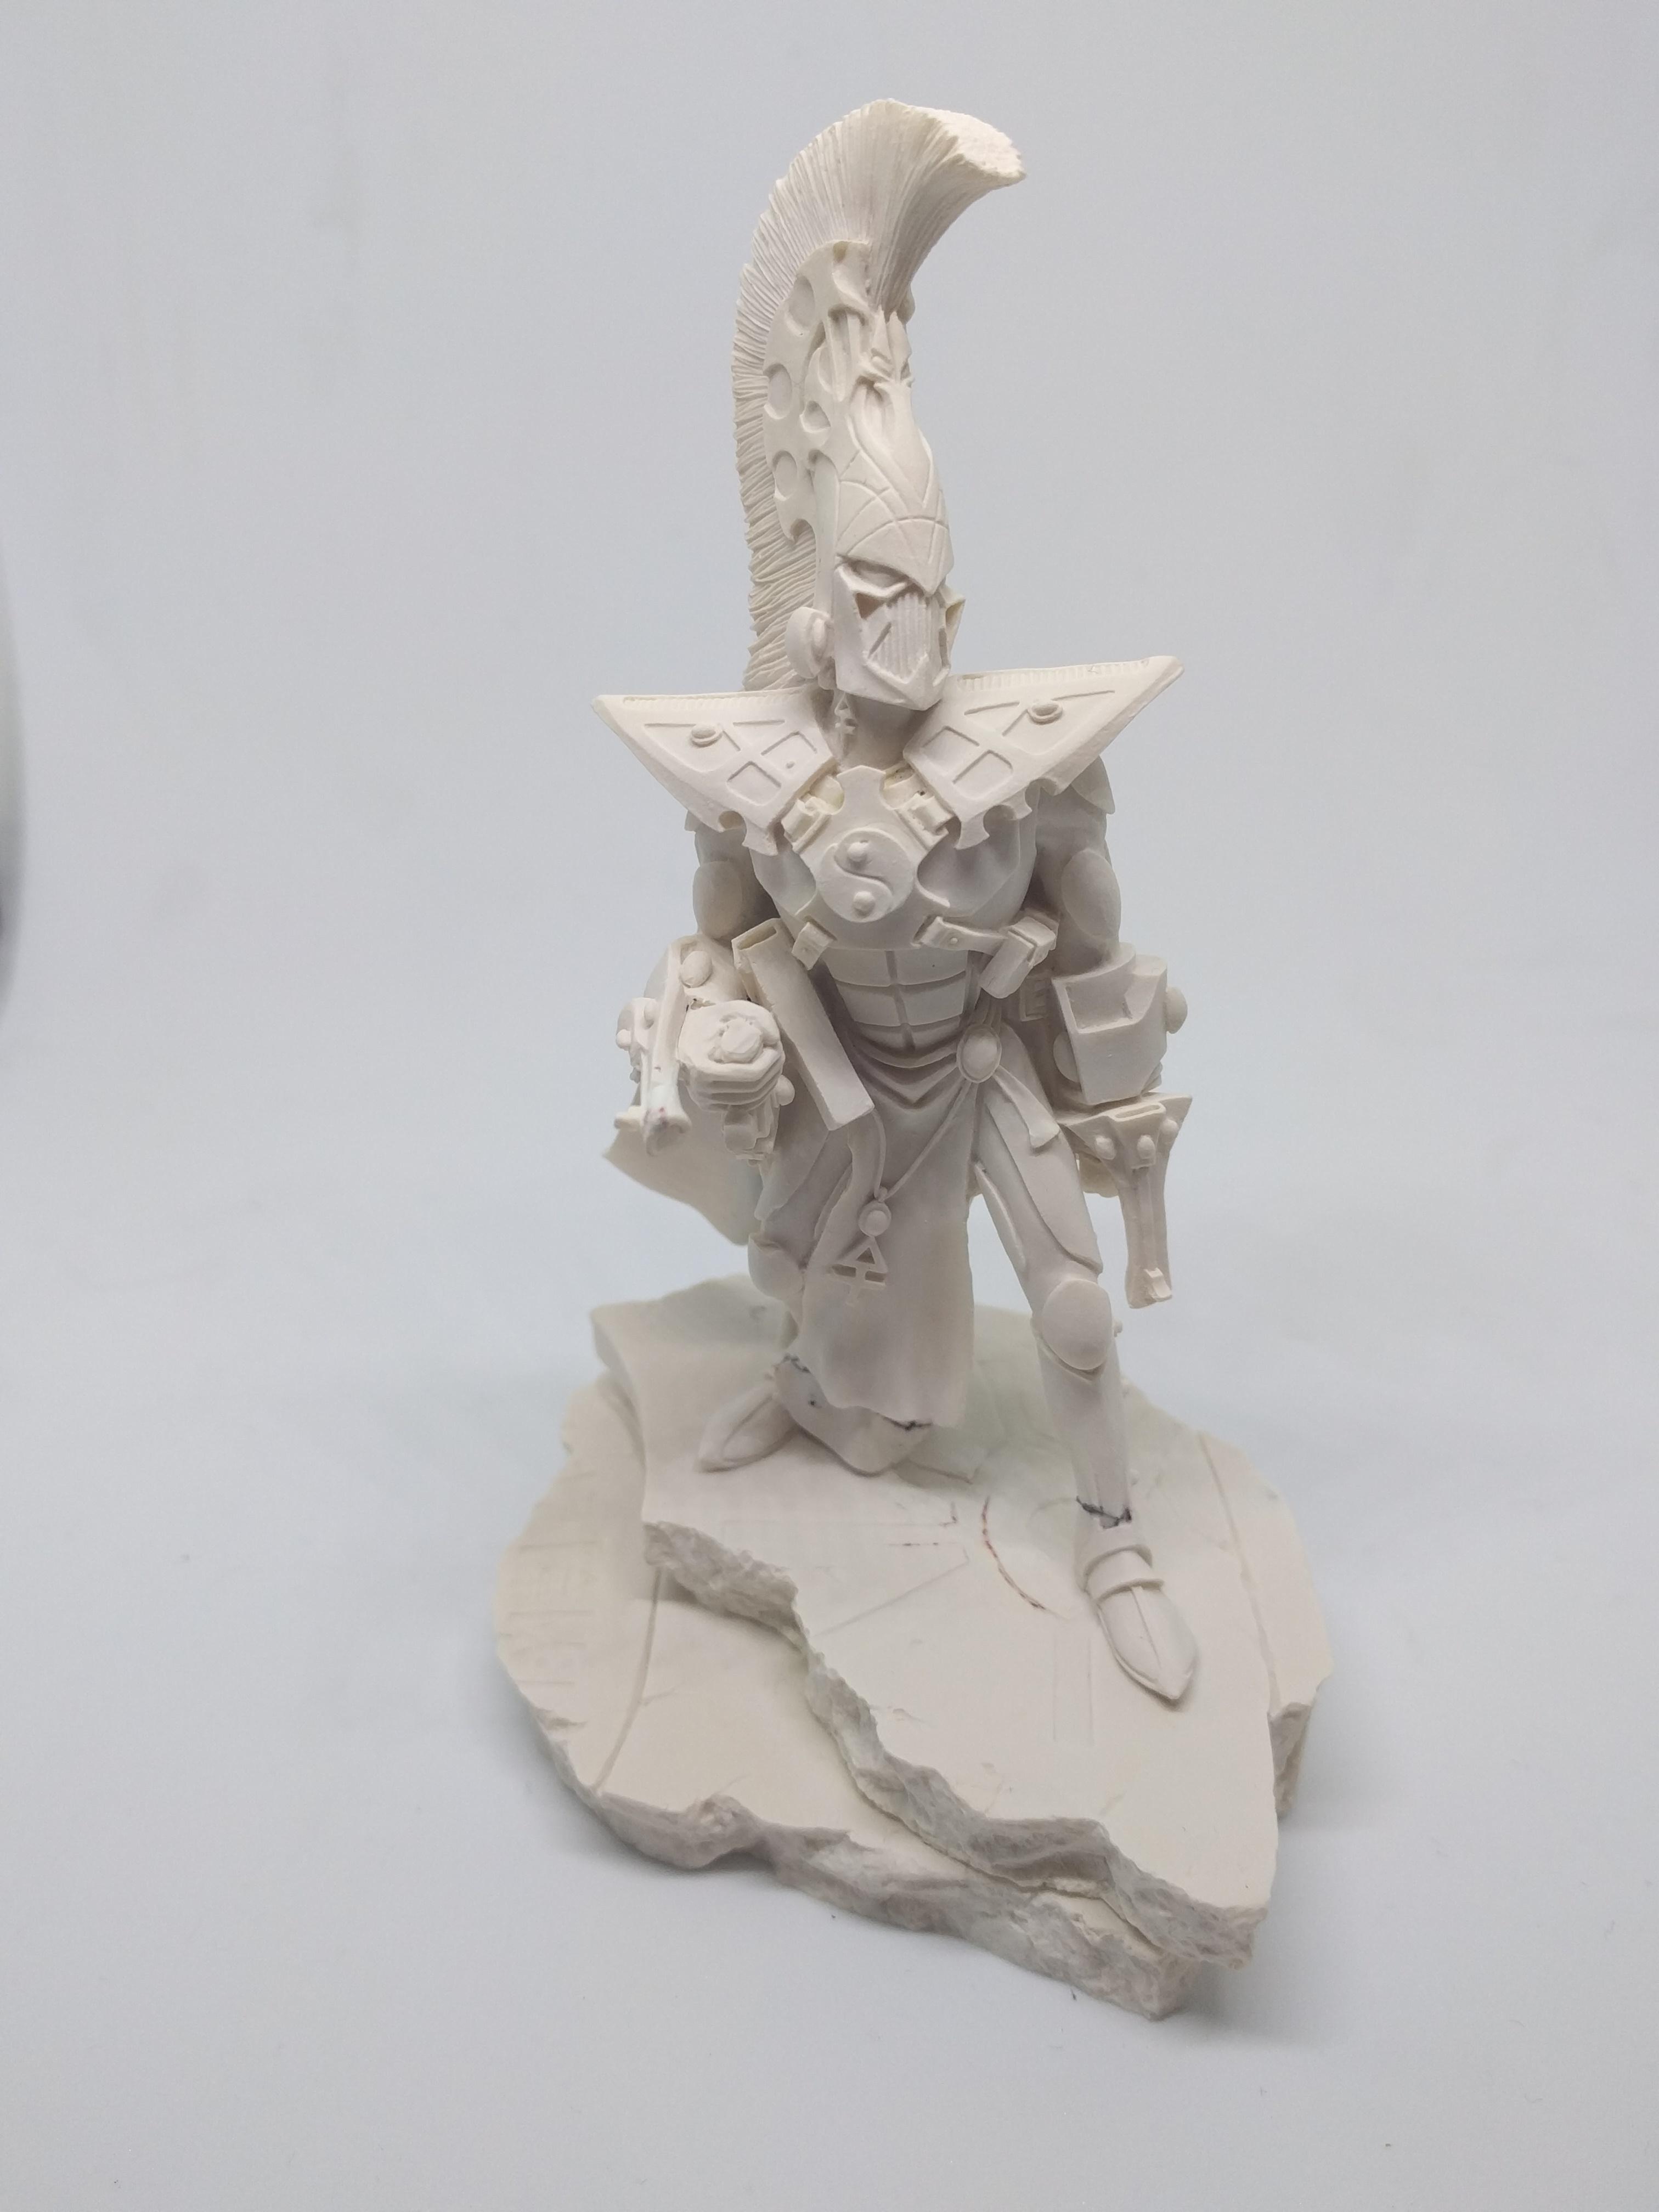 Asurmen Eldar Bust Statue Warhammer Forgeworld